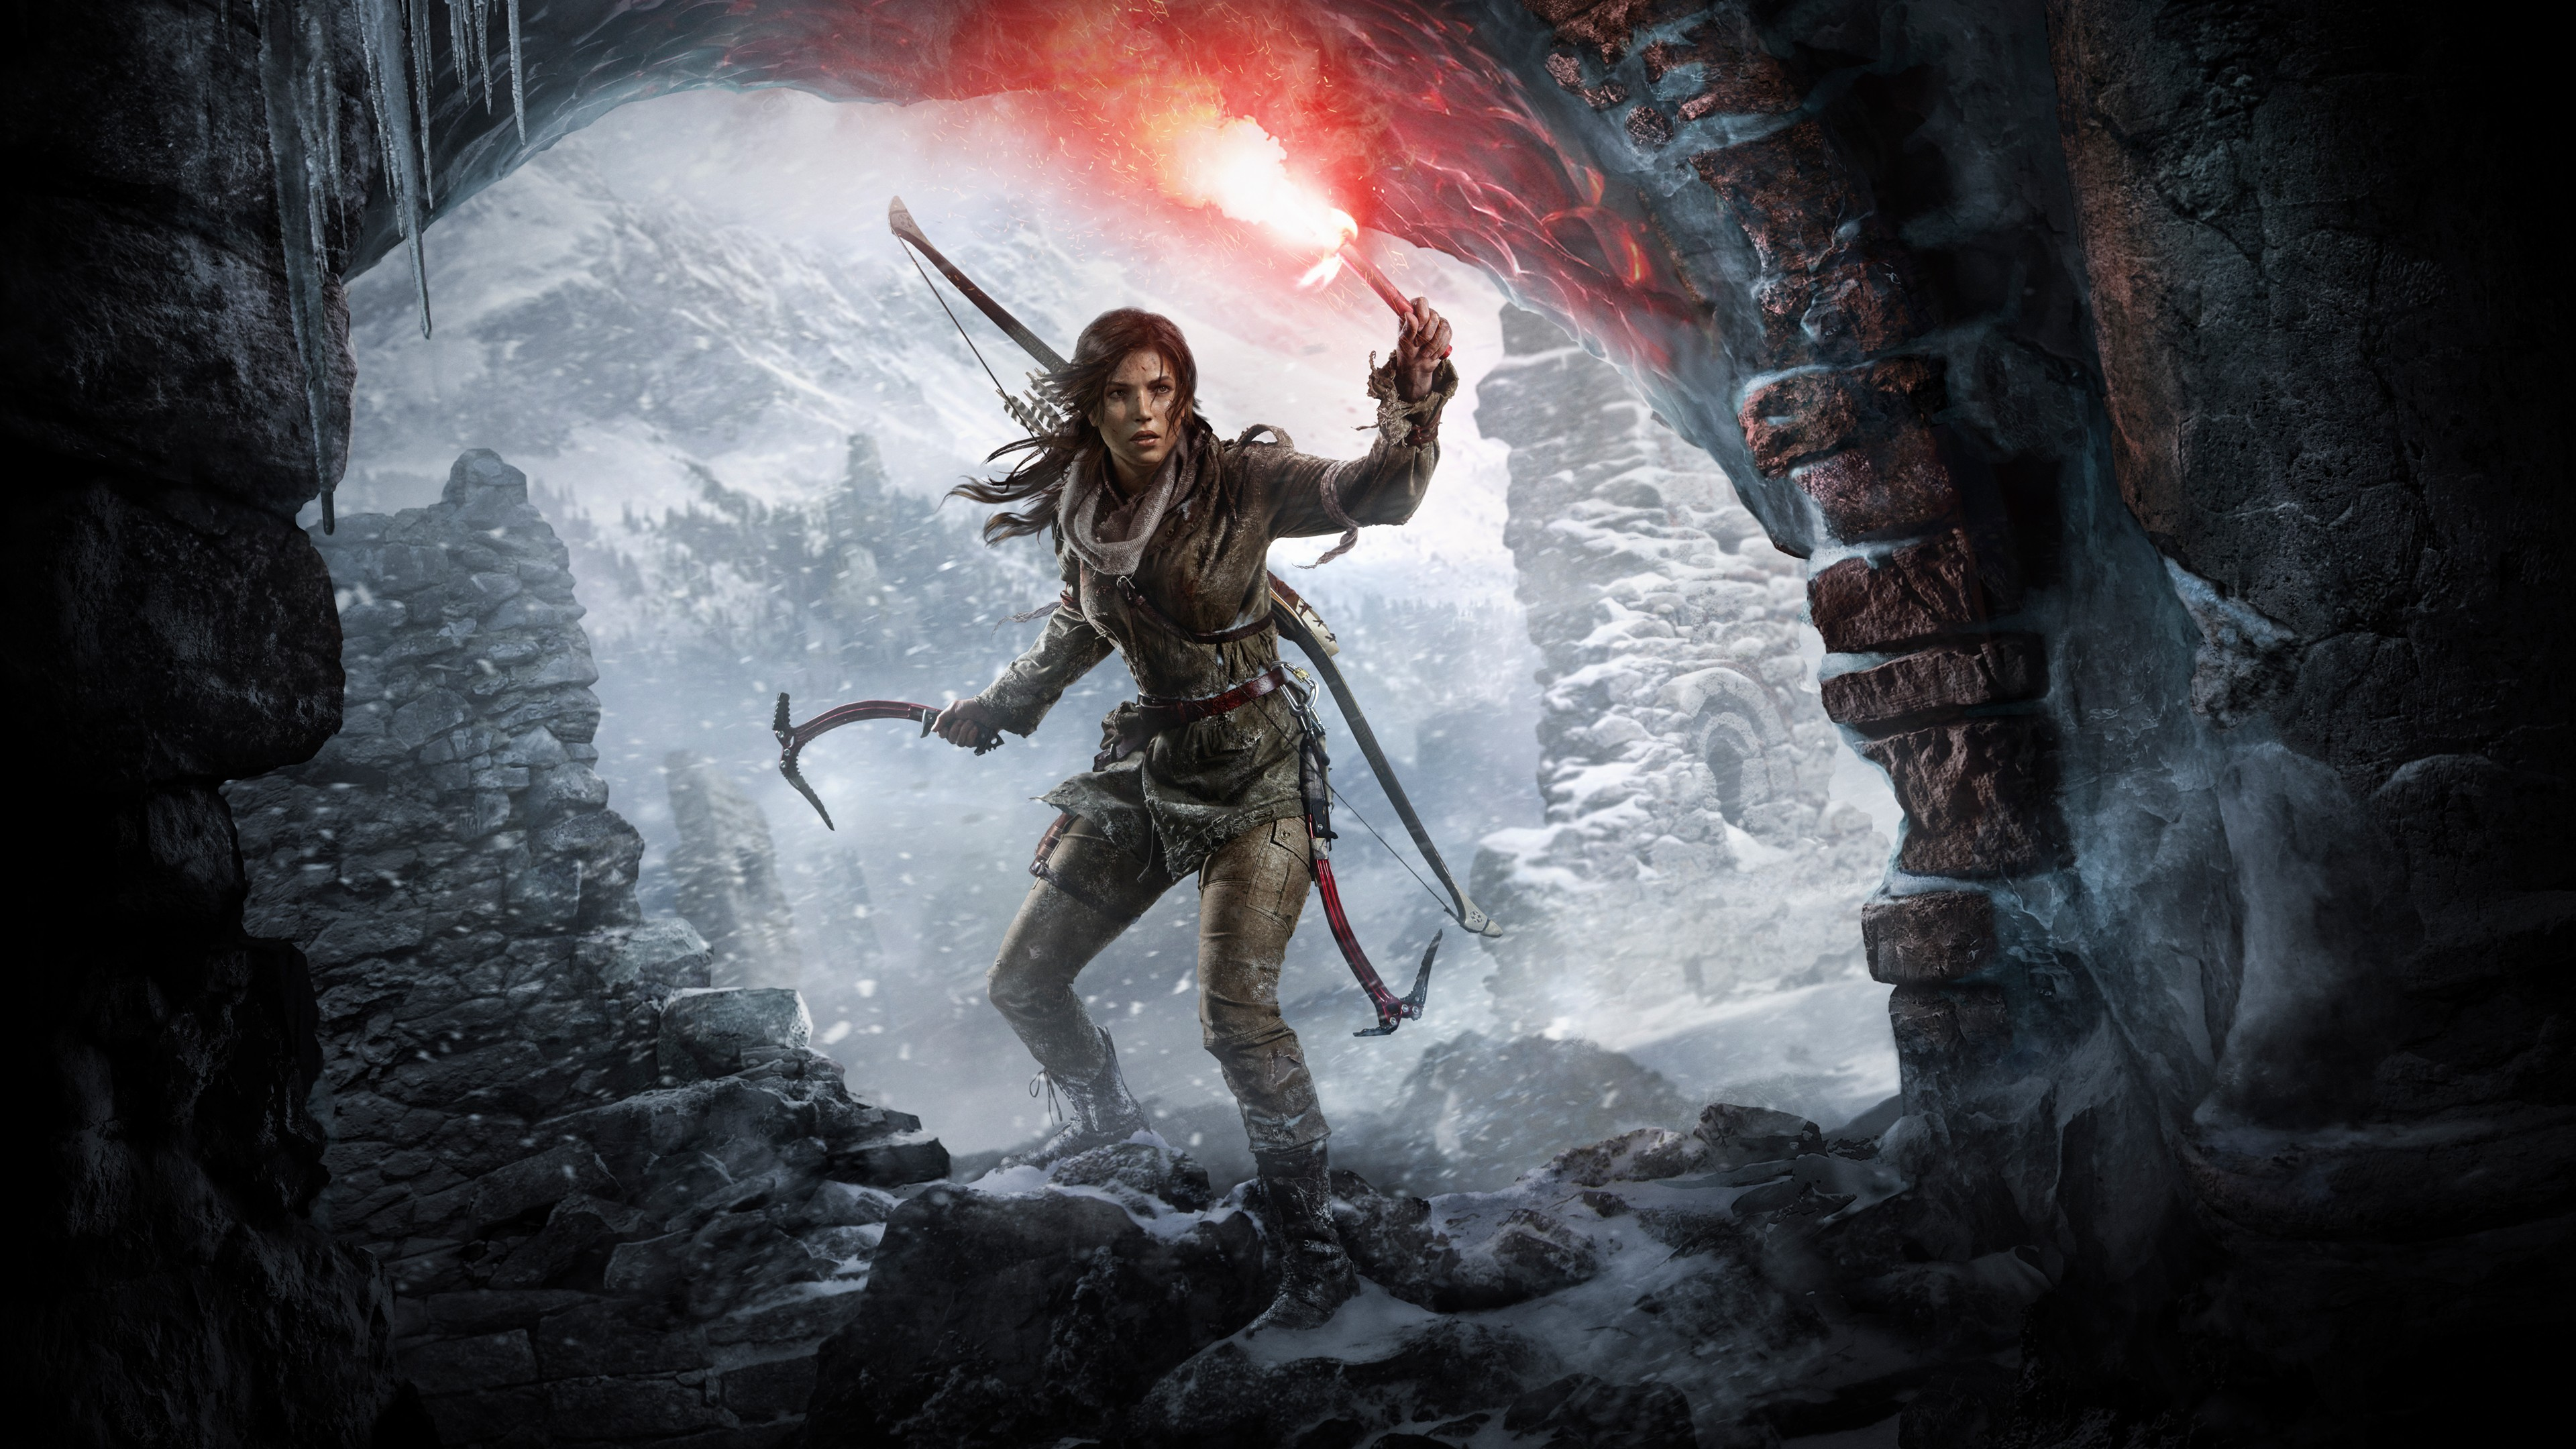 Majstersztyk. Cudo. Rewelacja. Rise of the Tomb Raider – recenzja Spider's Web